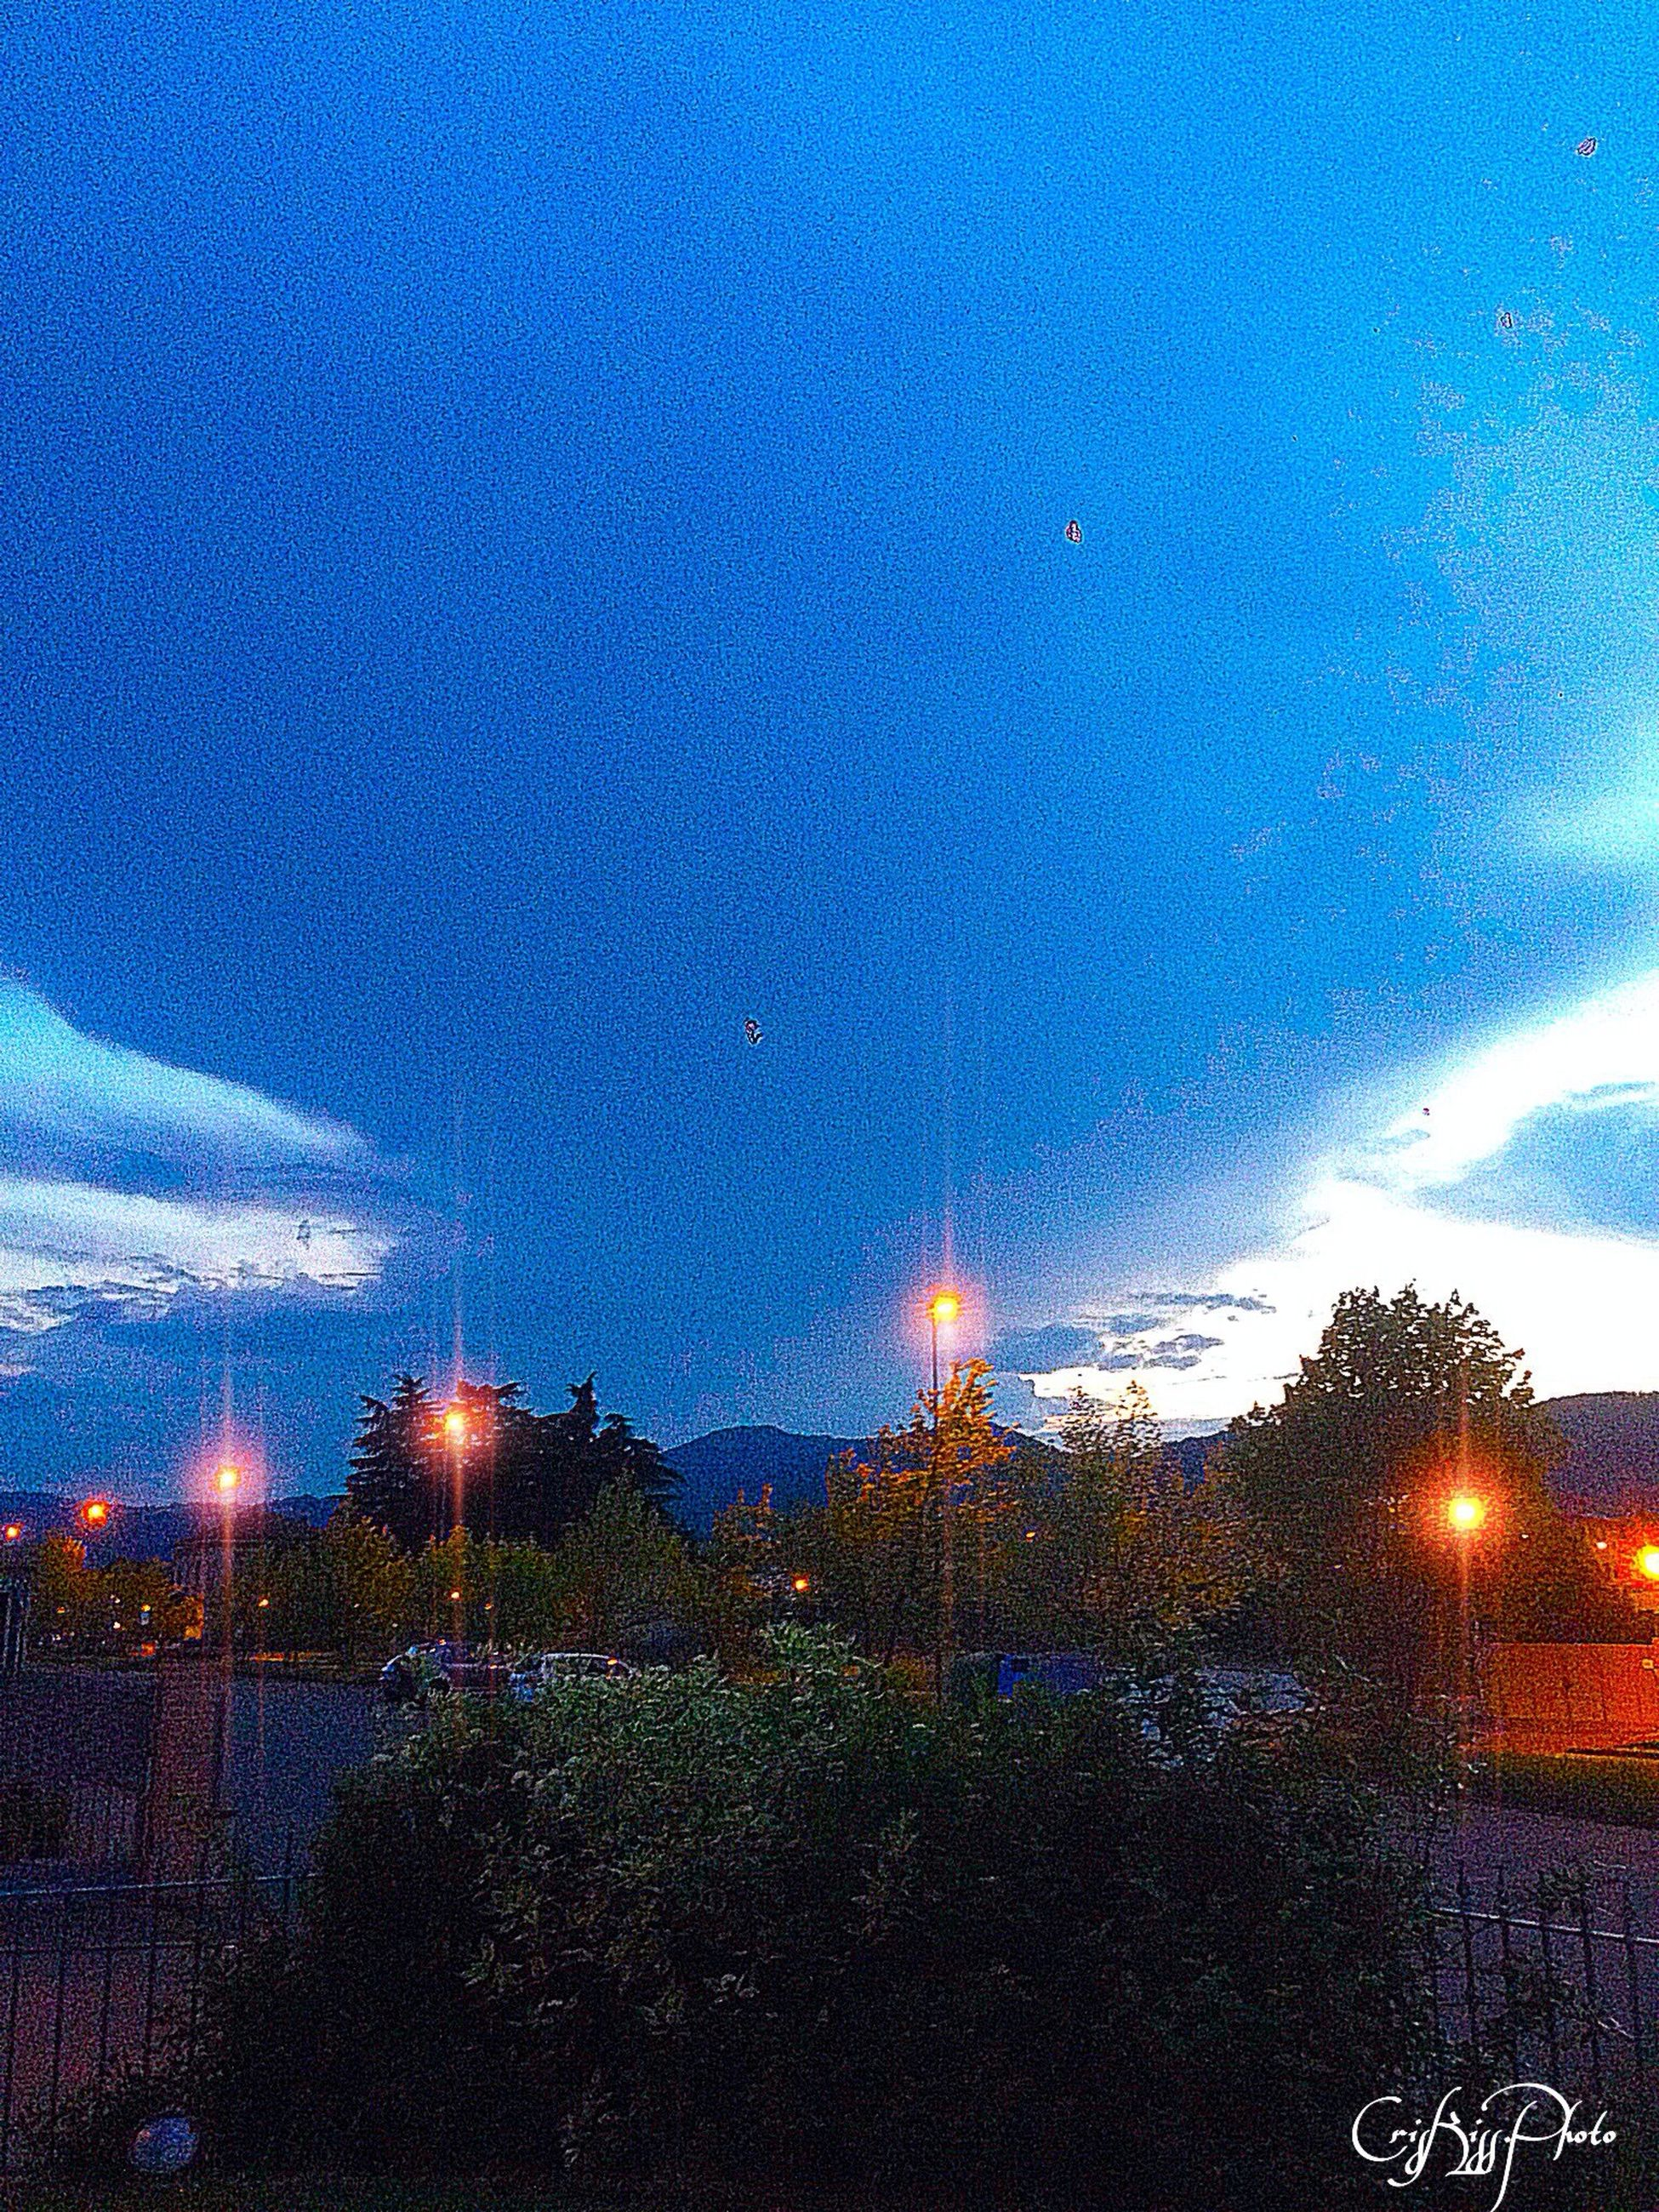 illuminated, window, sky, night, glass - material, transparent, wet, drop, blue, season, weather, dusk, building exterior, rain, city, full frame, water, sunset, no people, backgrounds